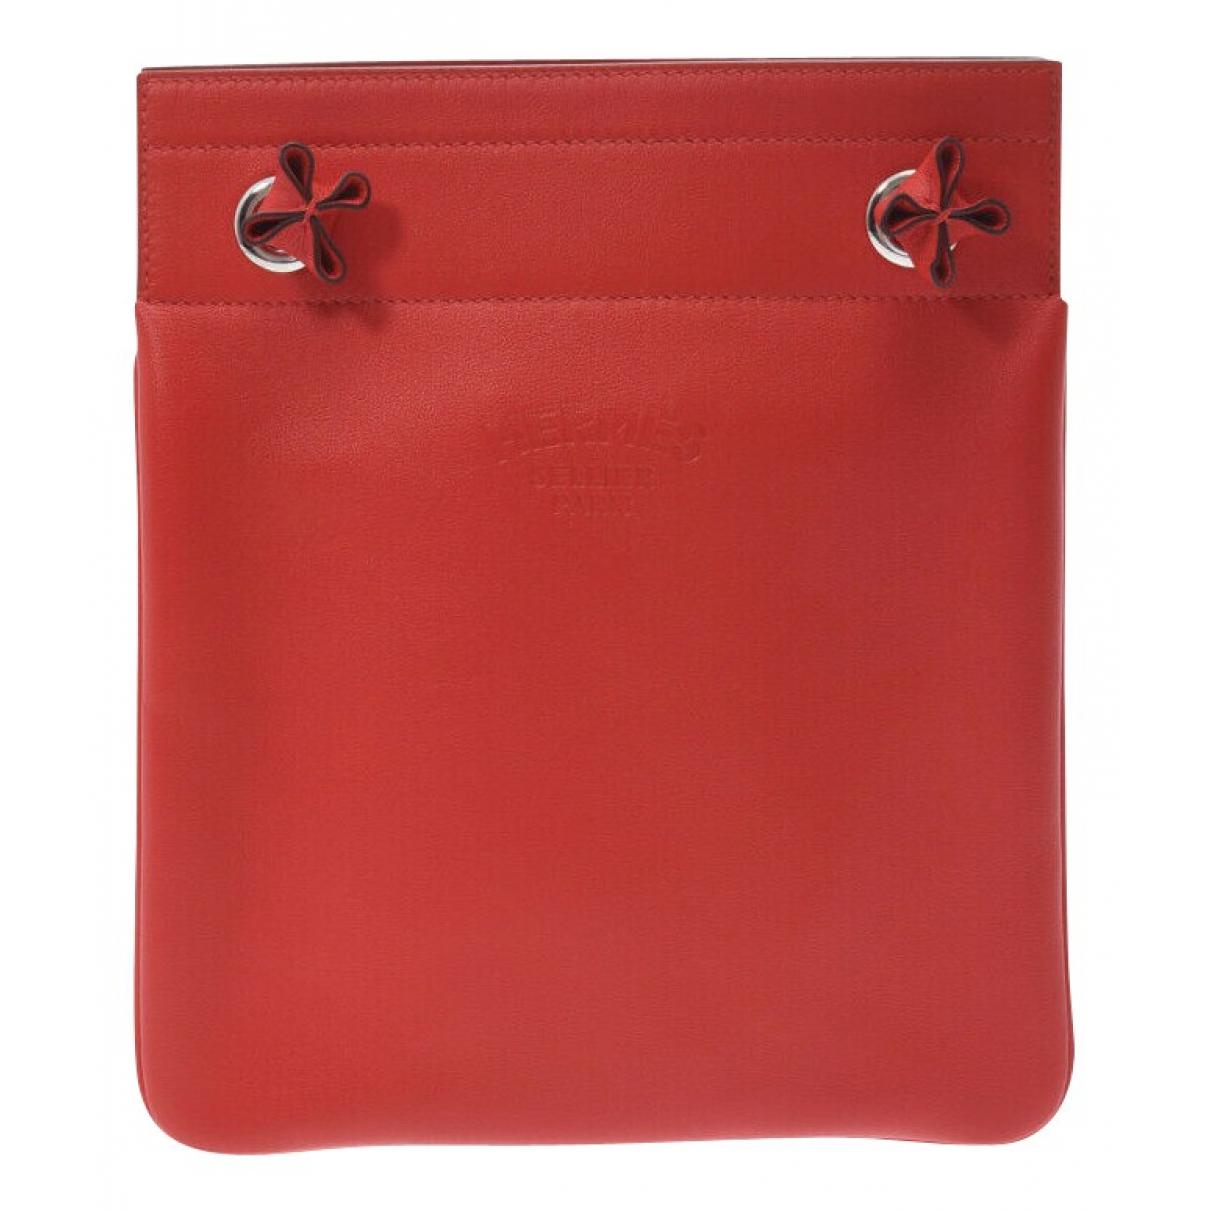 Hermès \N Red Leather handbag for Women \N